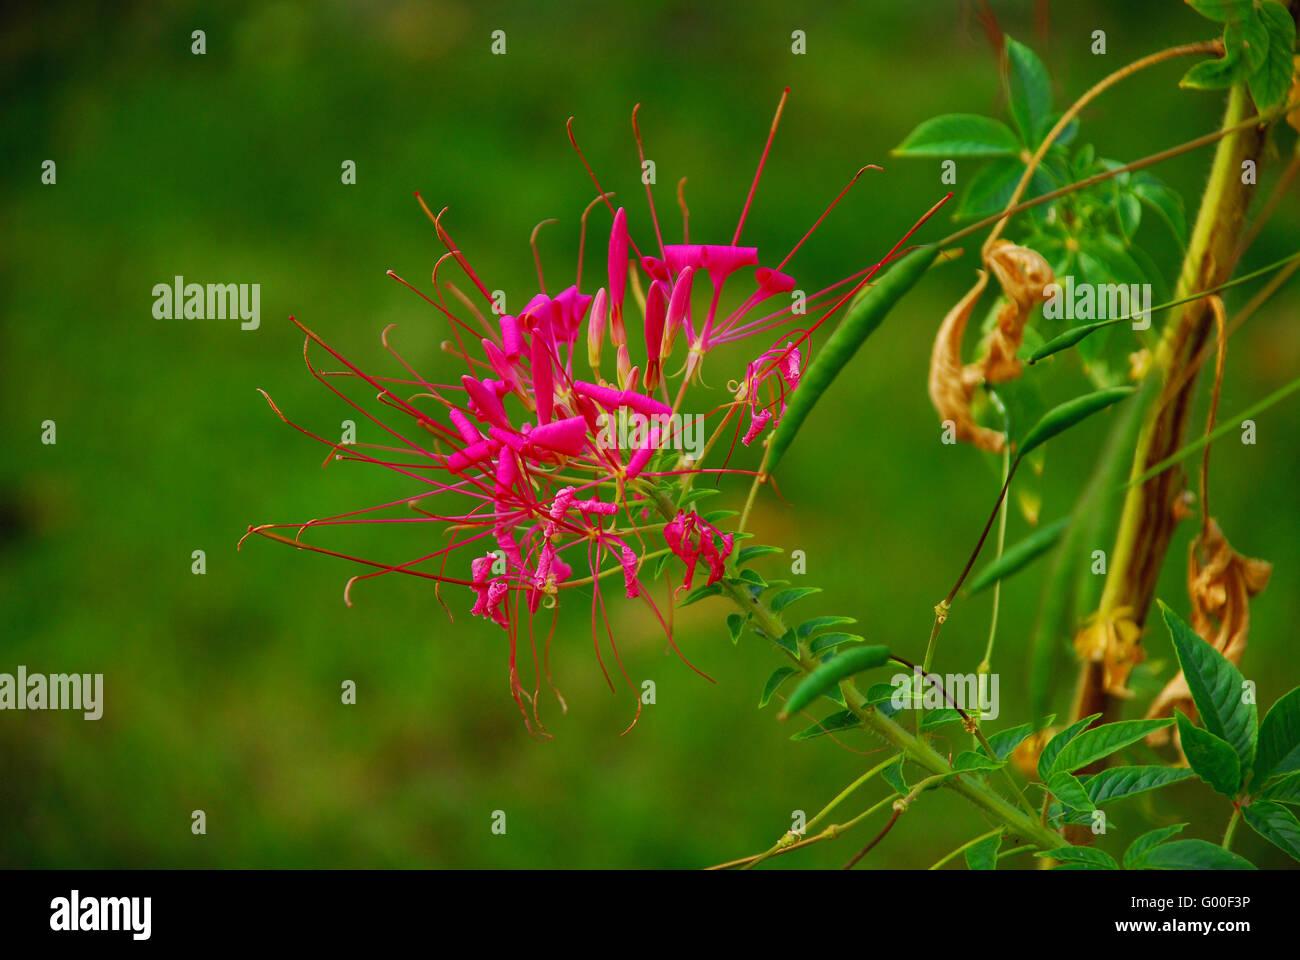 spider flower - Stock Image